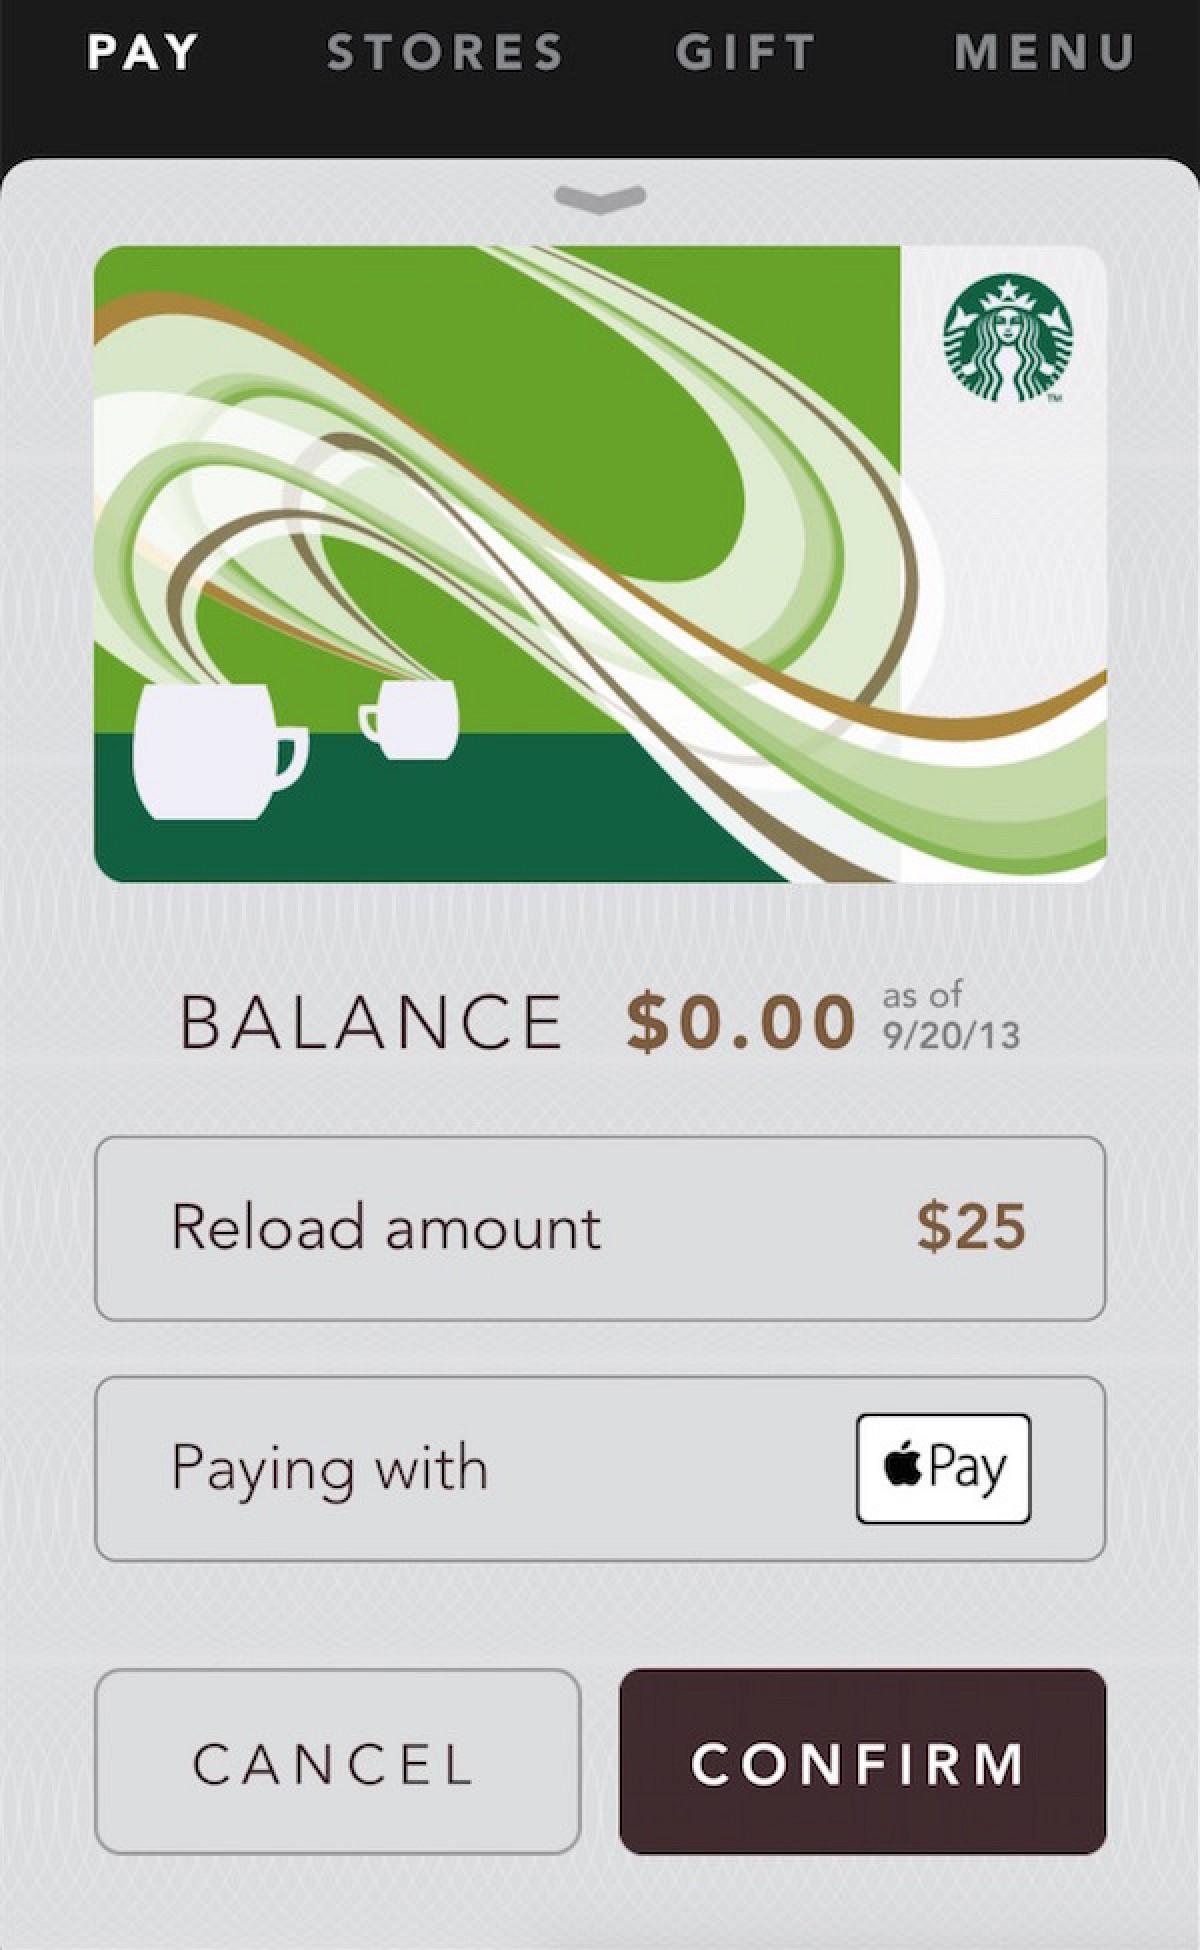 Starbucks iOS App Gains Support for Apple Pay - Mac Rumors